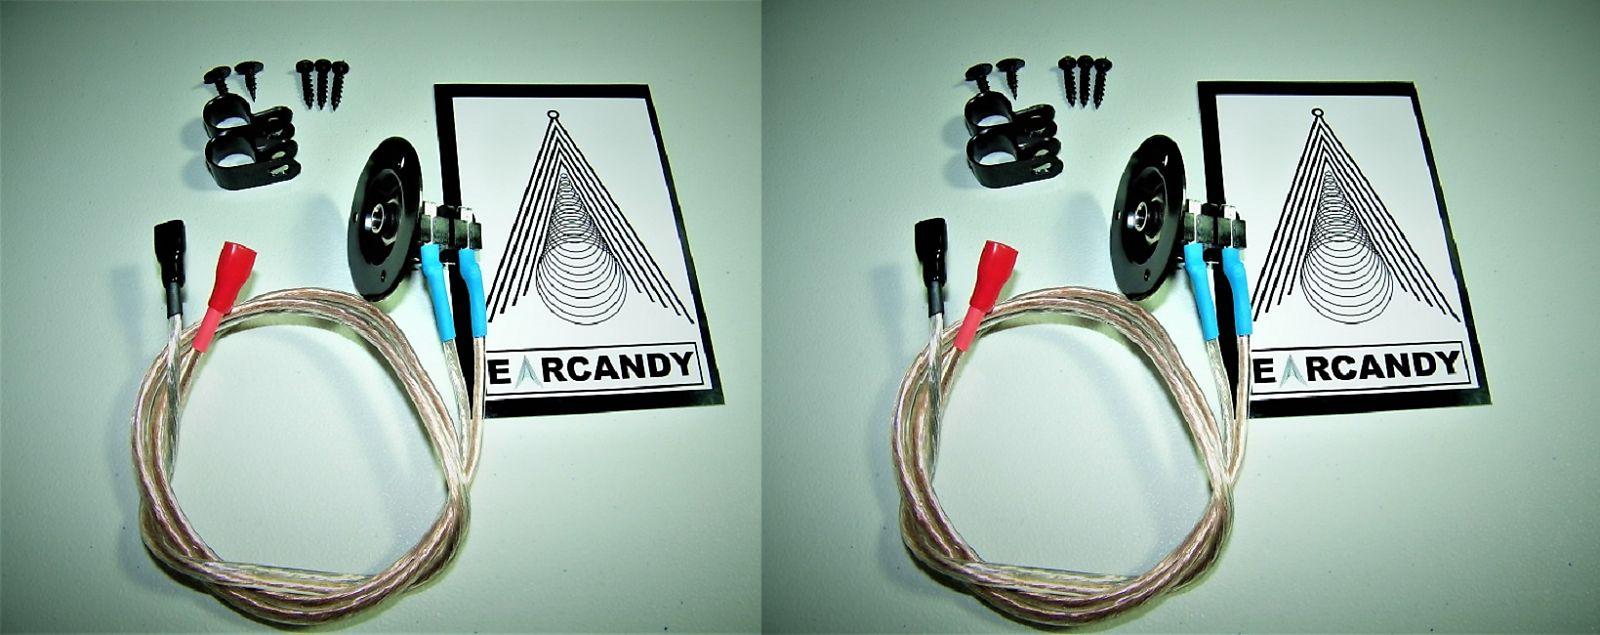 EarCandy MIL SPEC 1x12 1x10 1x15 guitar amp speaker cab cabinet ...